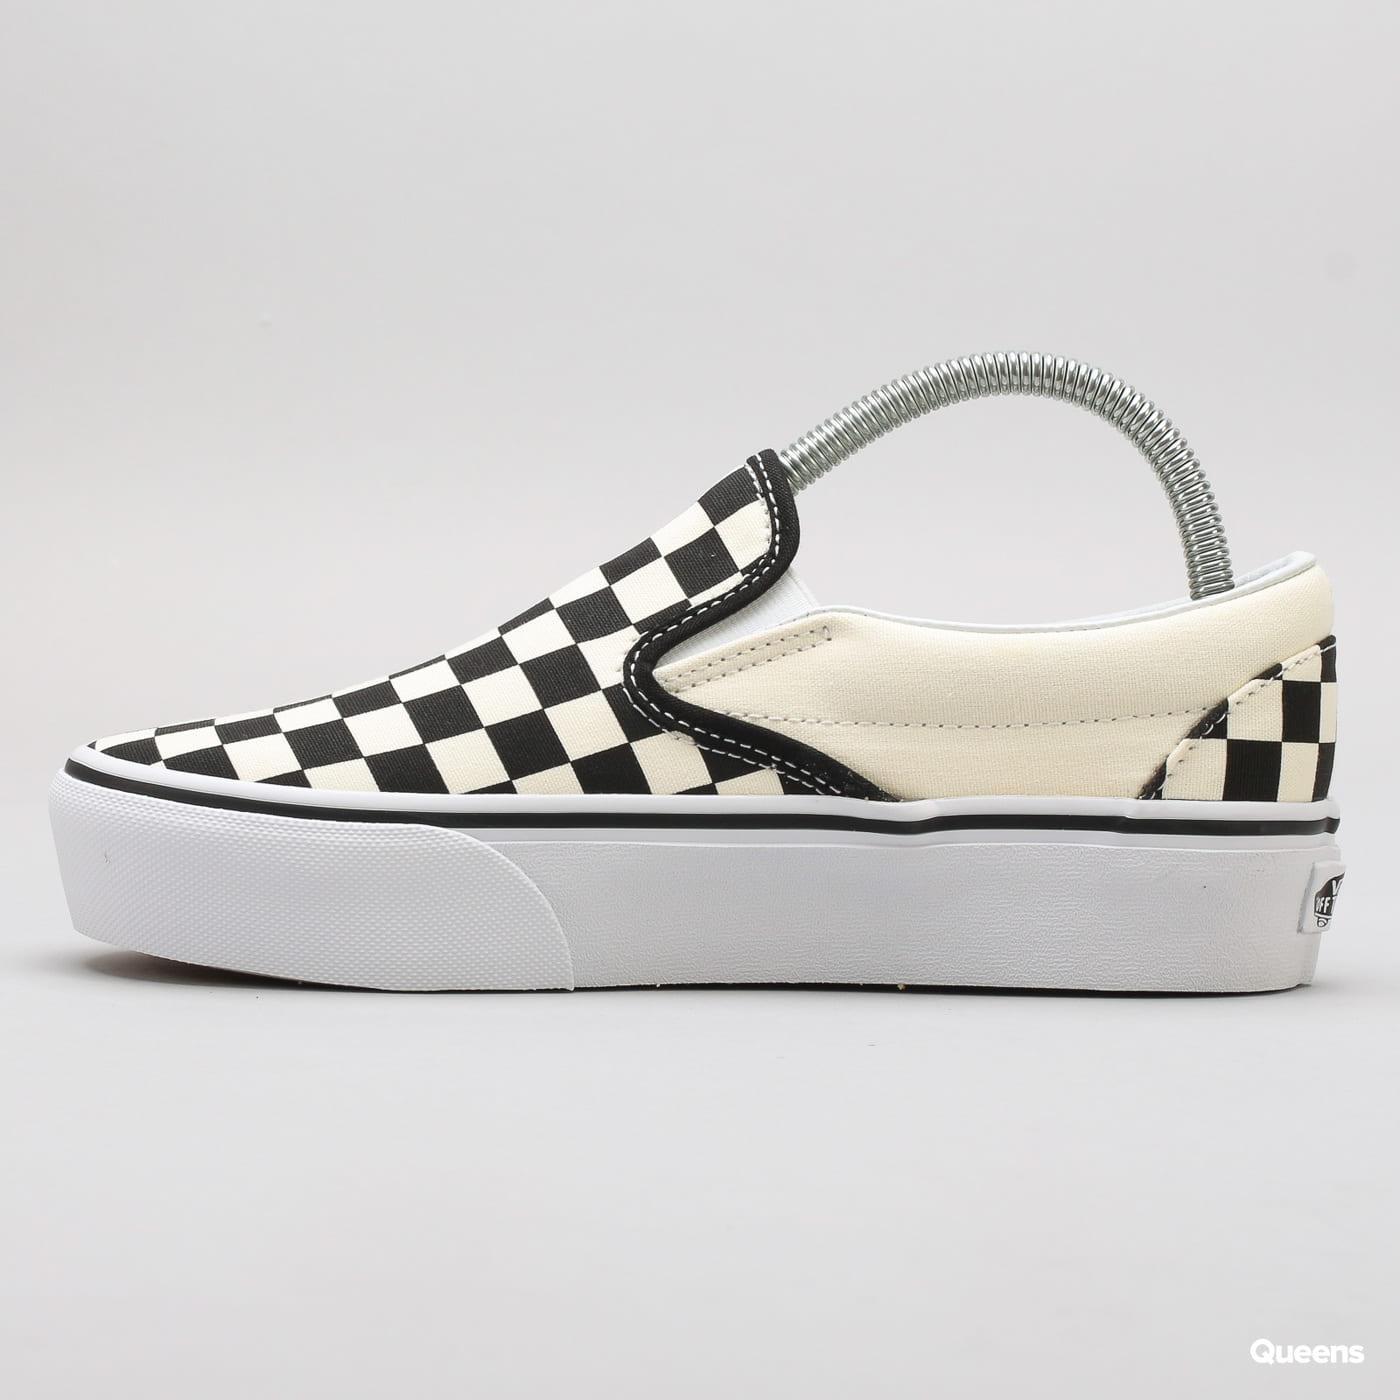 Vans Classic Slip-On Platform black & white checkerboard / white